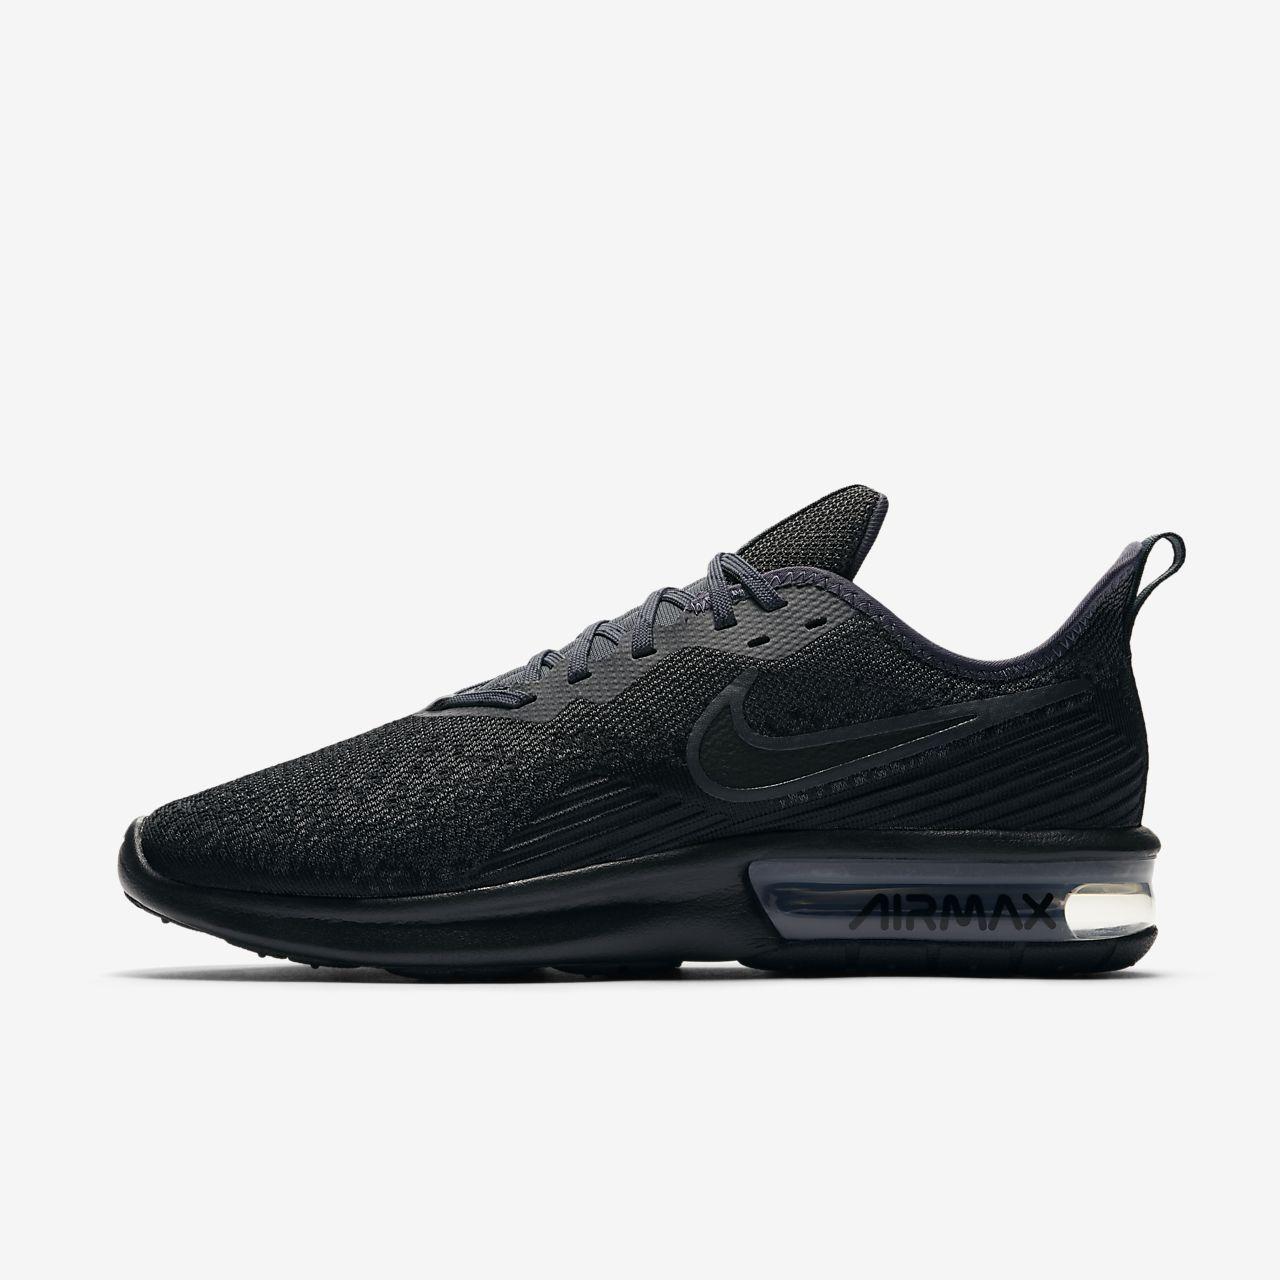 size 40 75987 d3c8f ... Calzado para hombre Nike Air Max Sequent 4